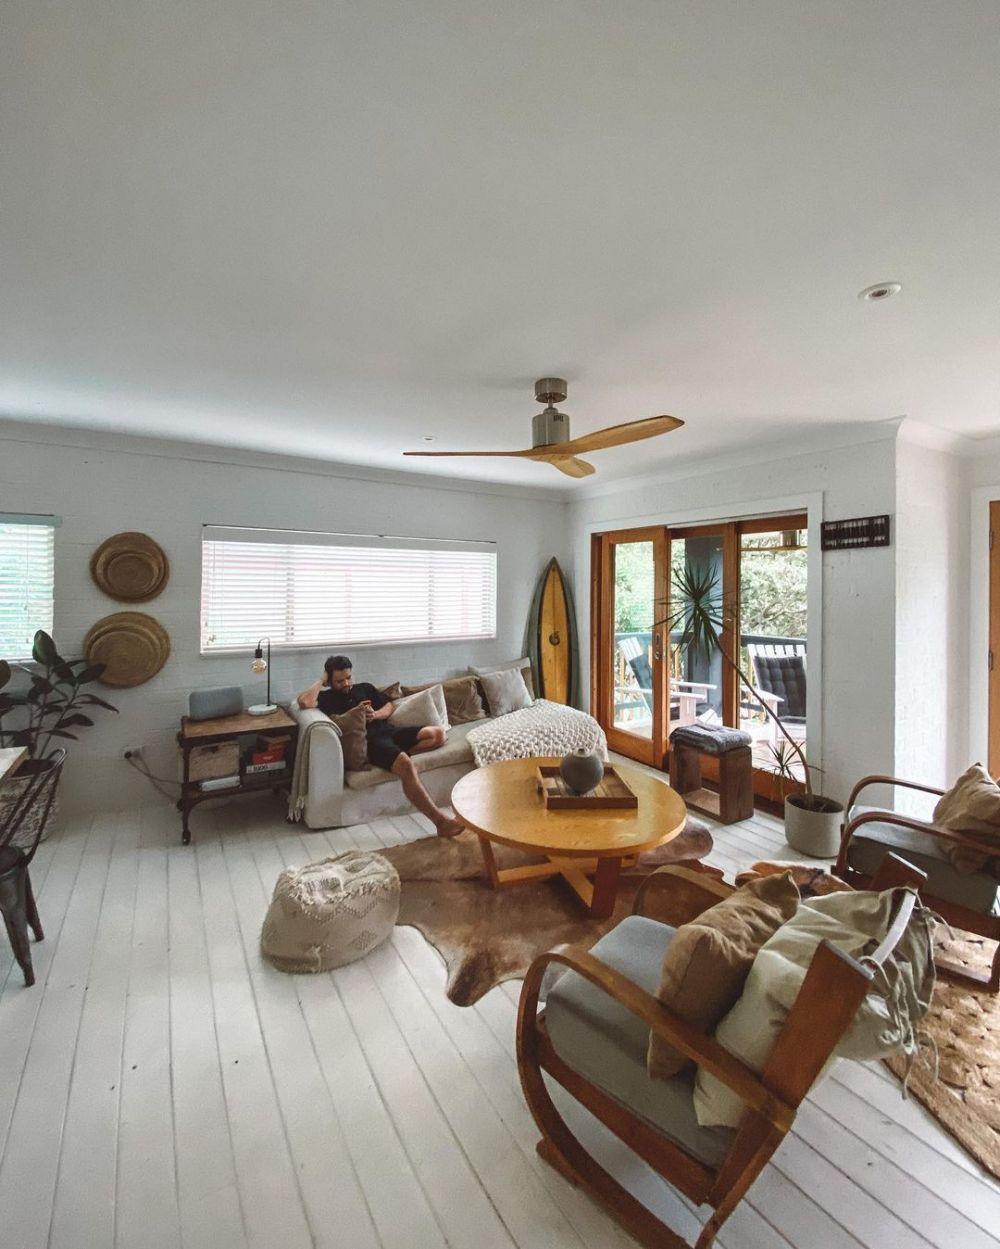 villa tempat inap Acha Sinaga di Byron Bay © 2021 brilio.net